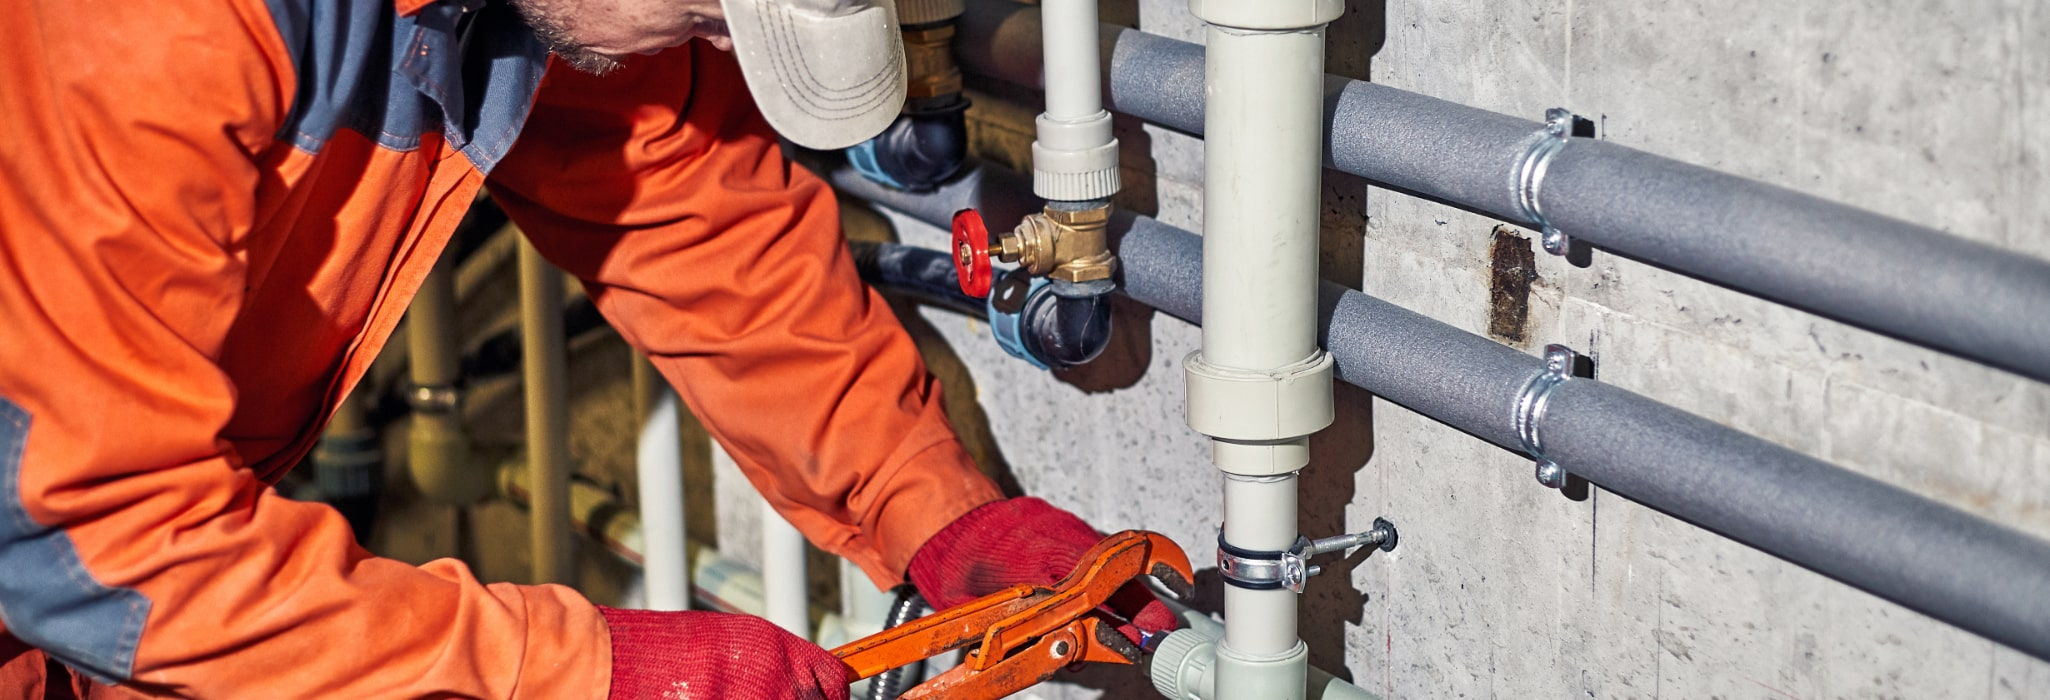 Commercial plumbing service.